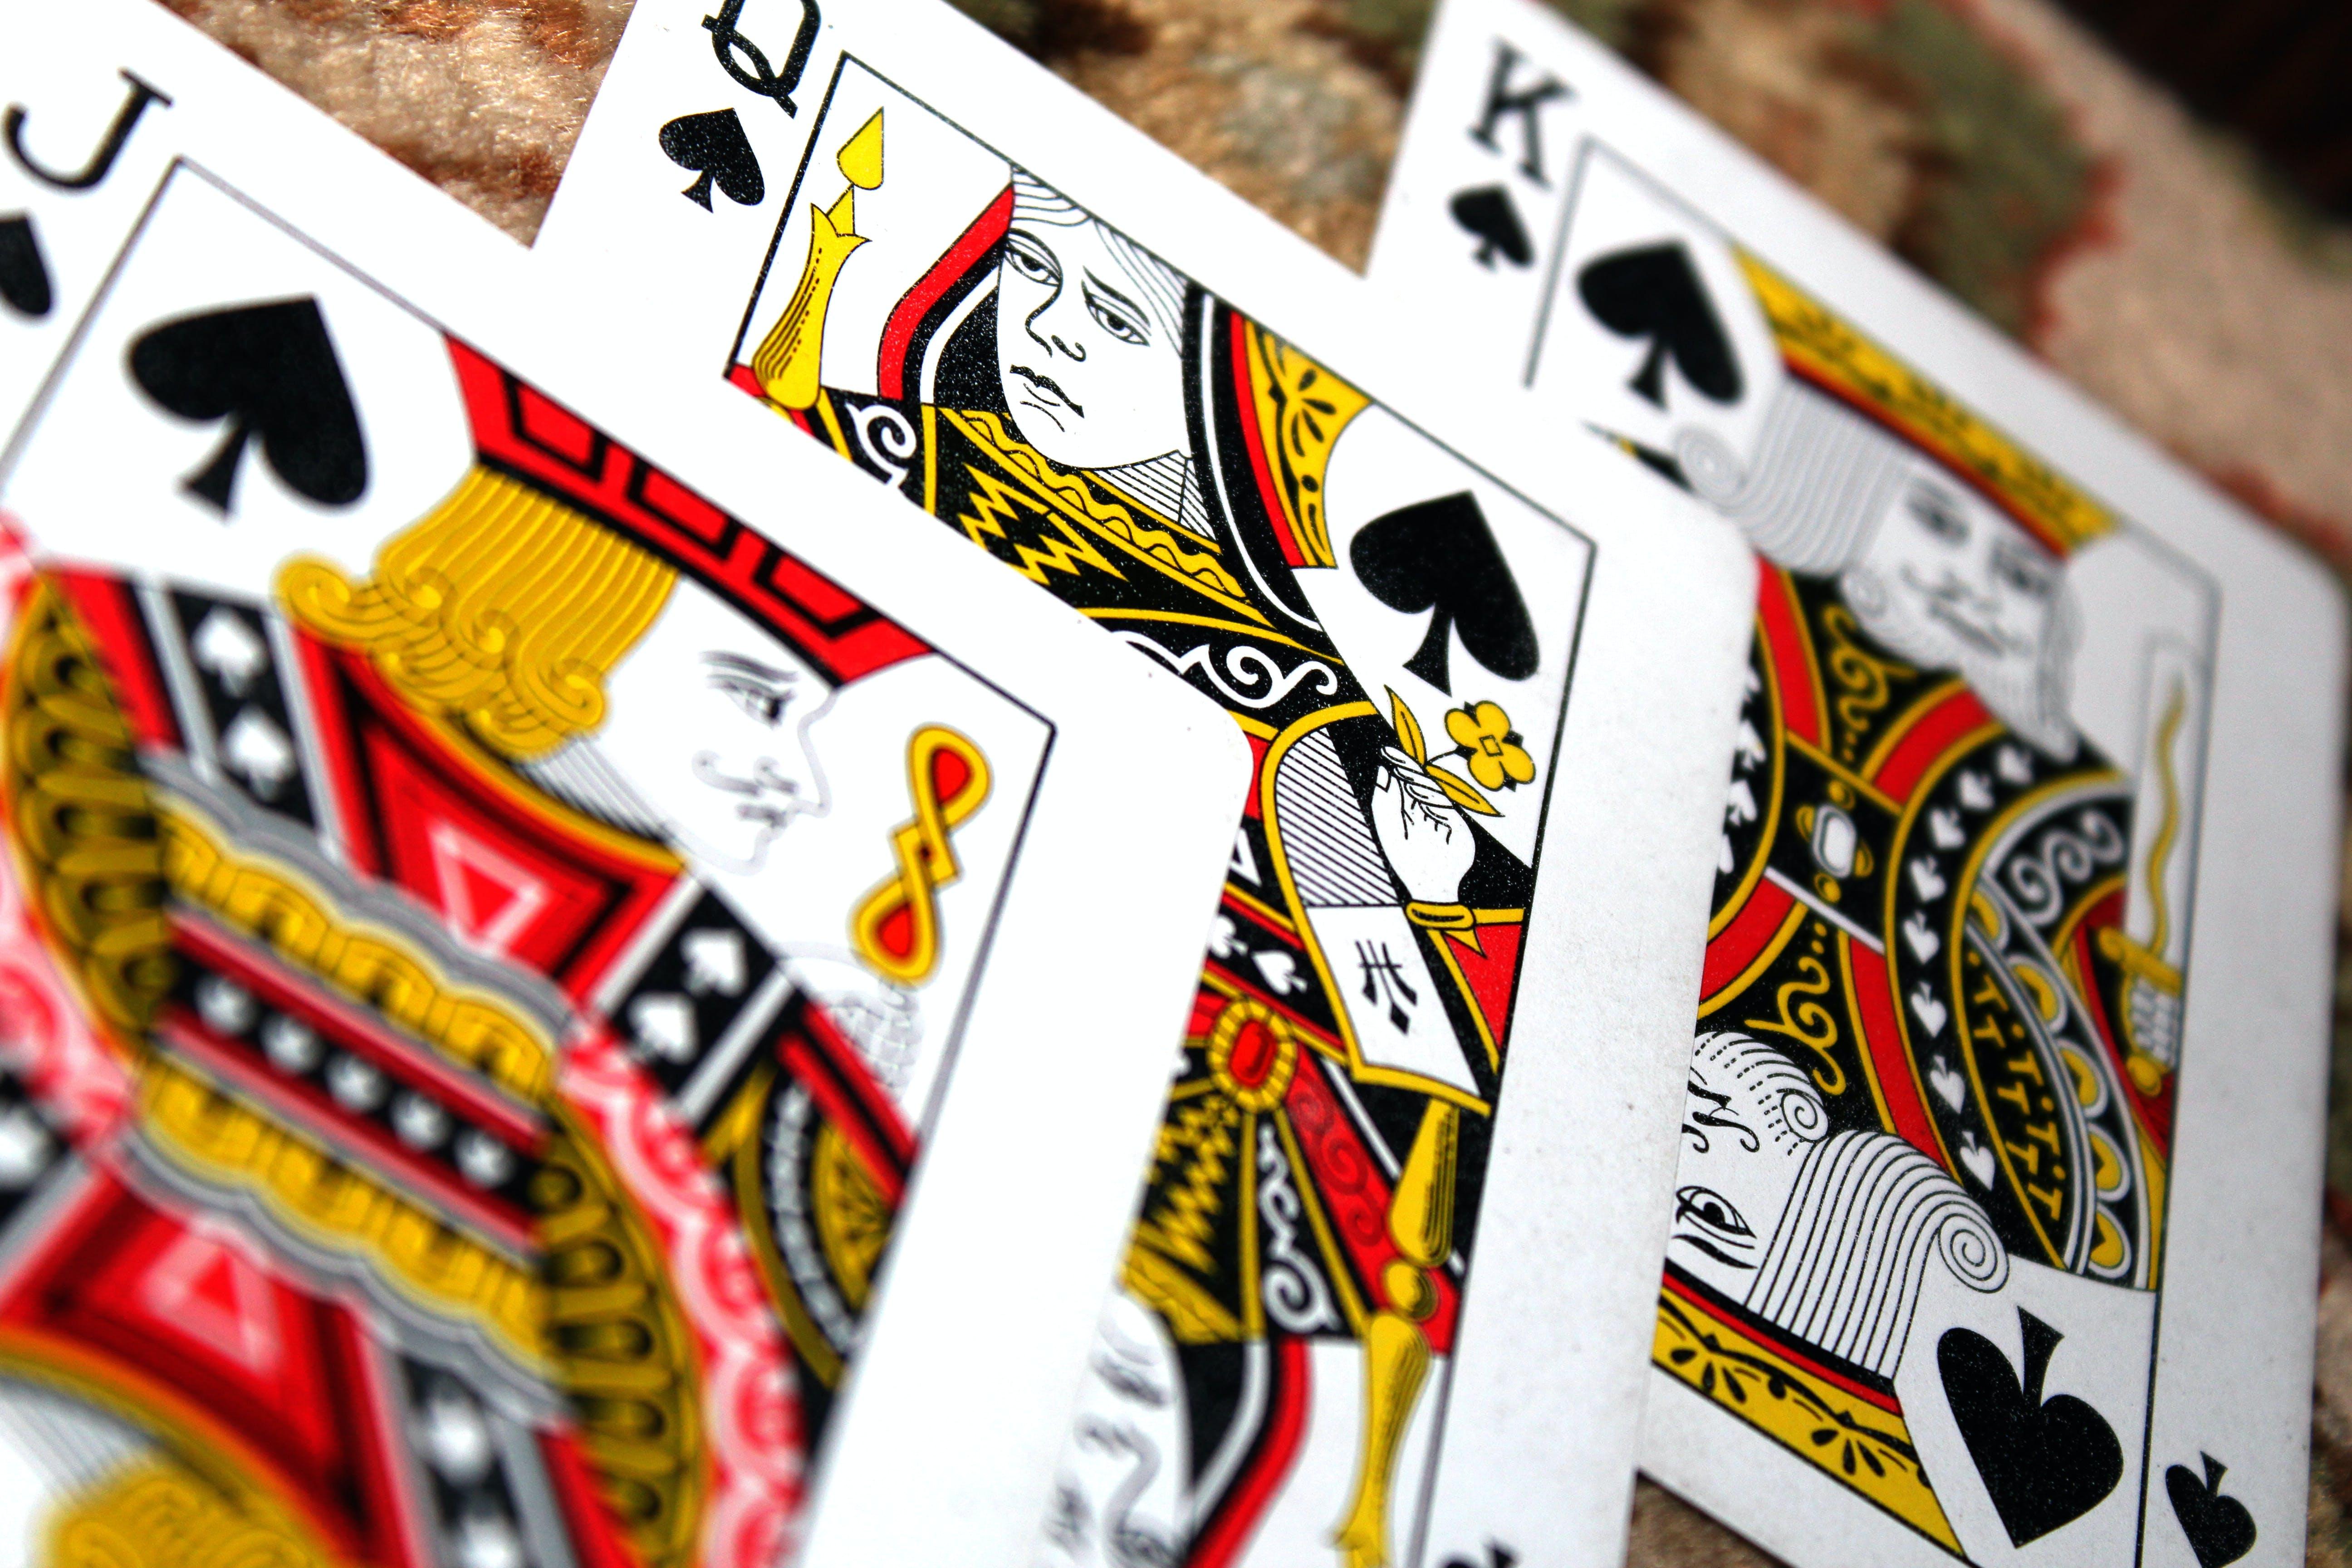 Nasapoker Agen Ceme Idn Poker Online Qq Terpercaya Indonesia Hayes Corbridge